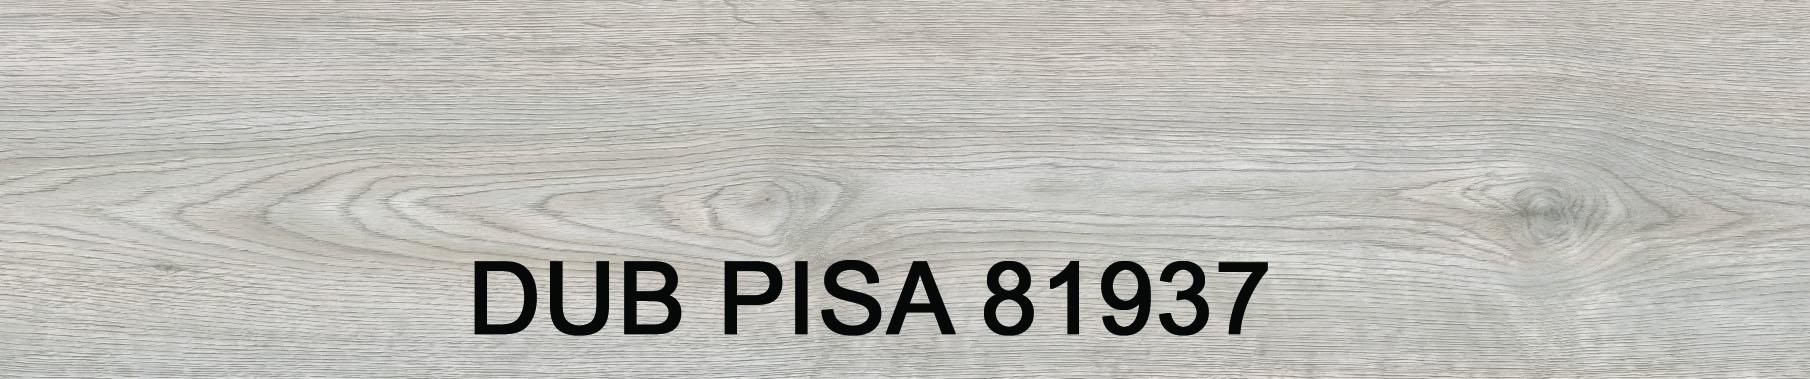 81937